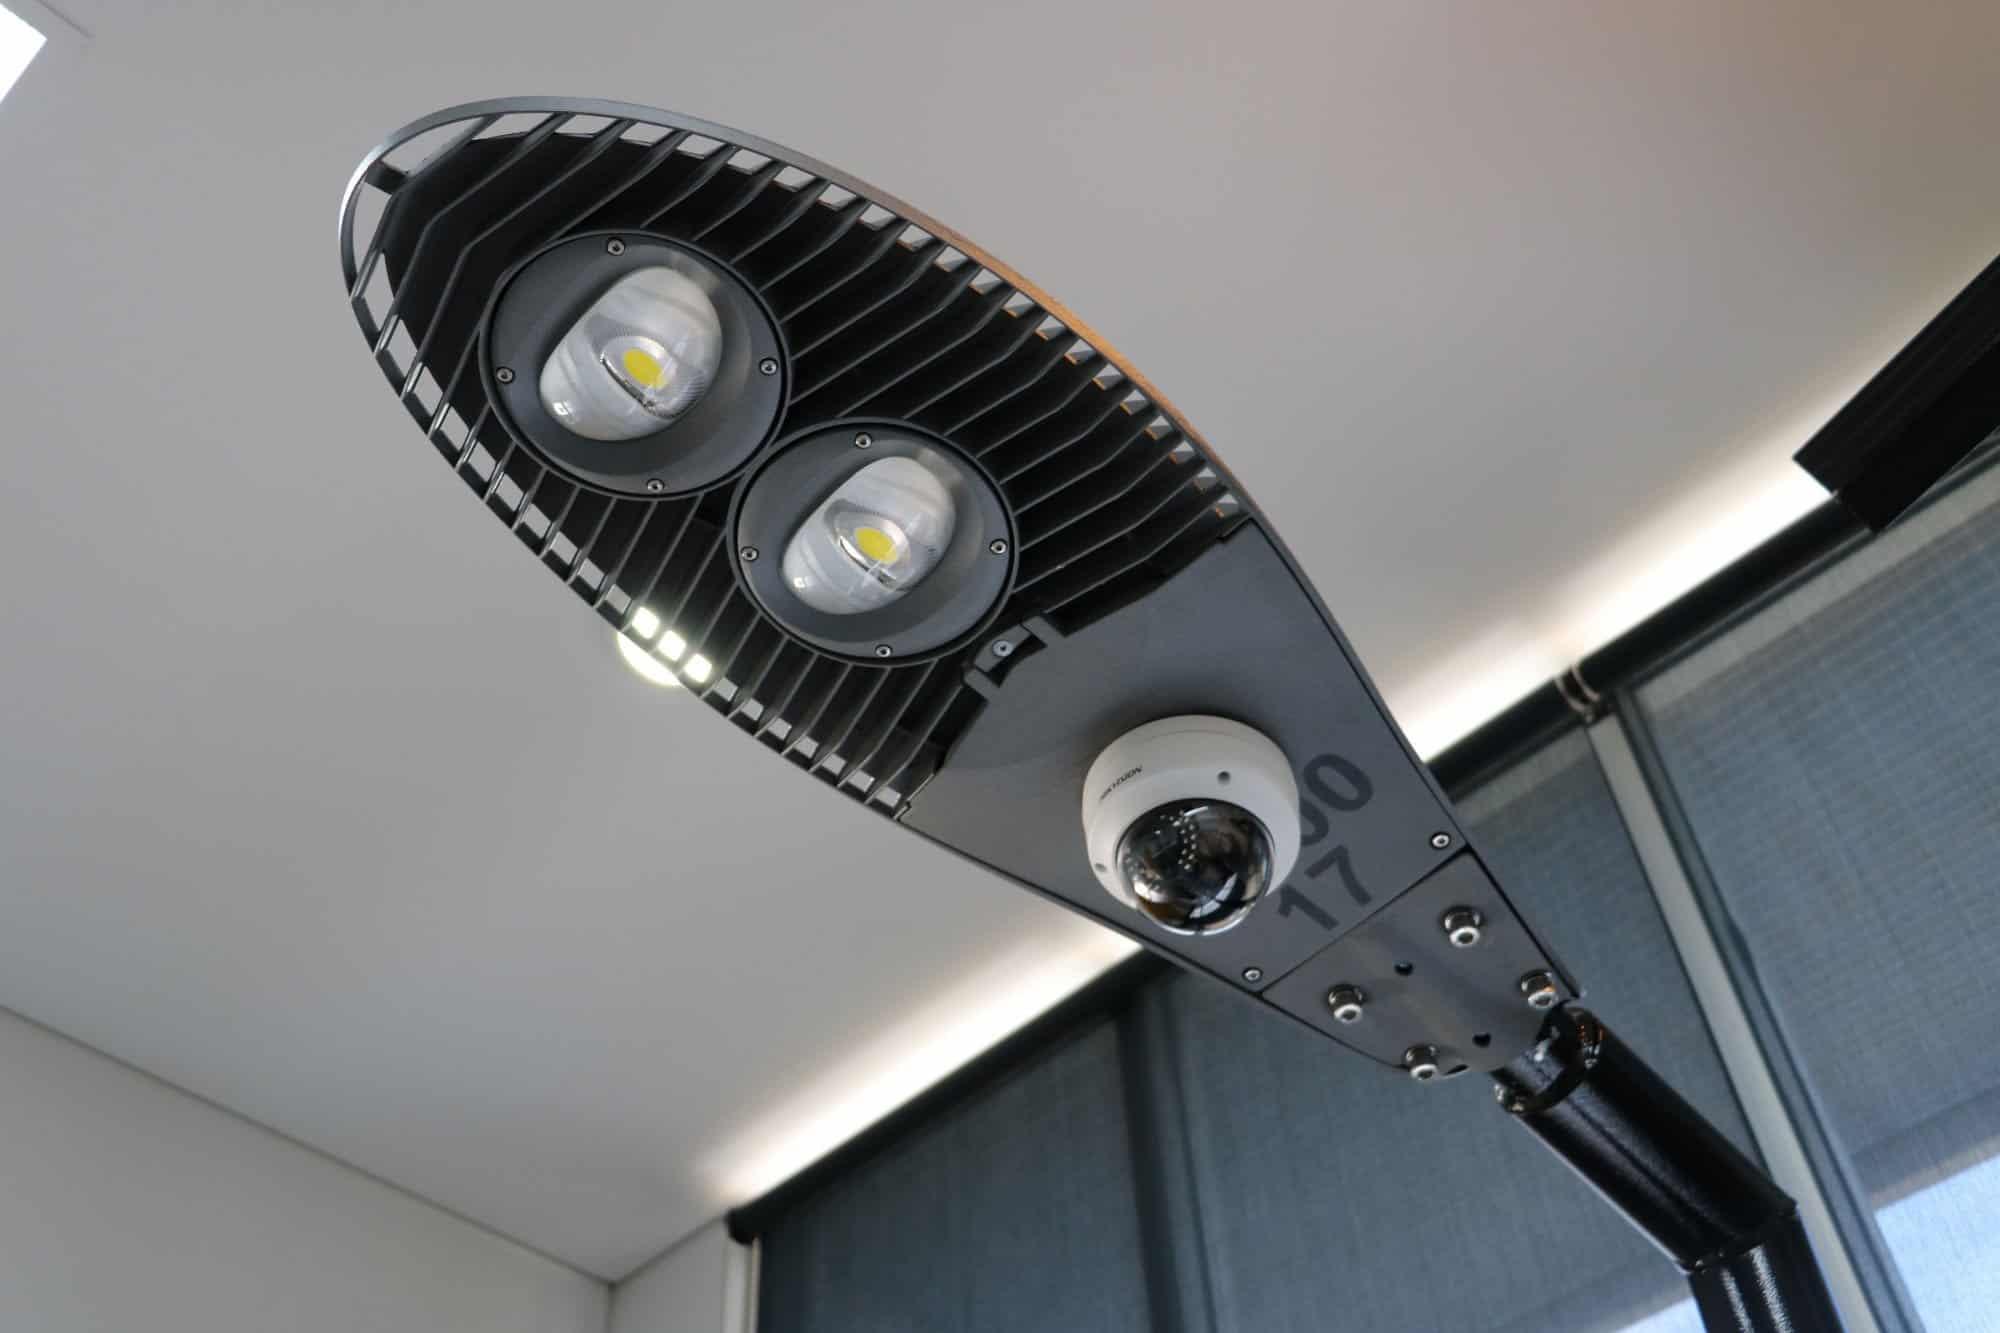 stret light mounted CCTV security camera